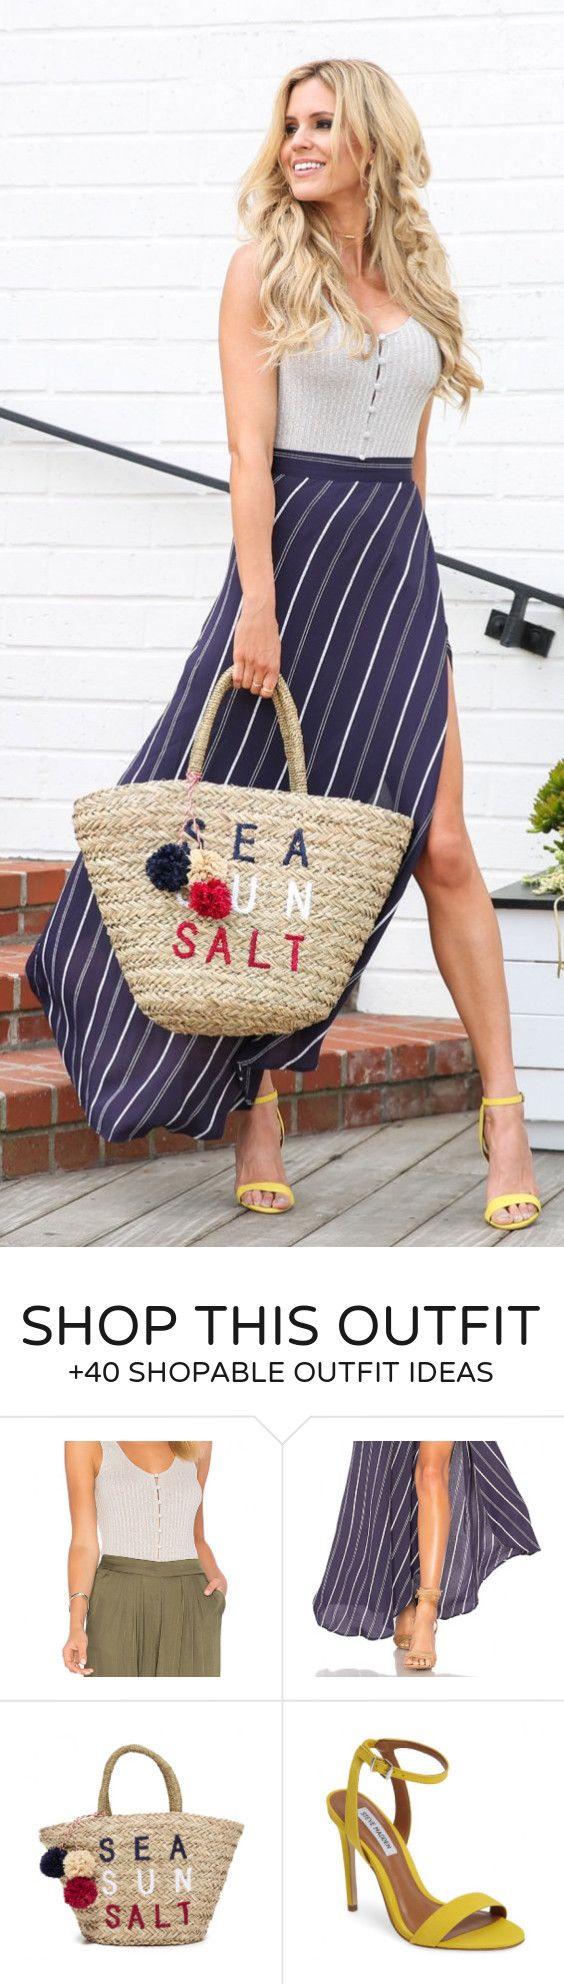 #outfits #summer superior gris + rayado púrpura de la falda maxi + sandalias amarillas